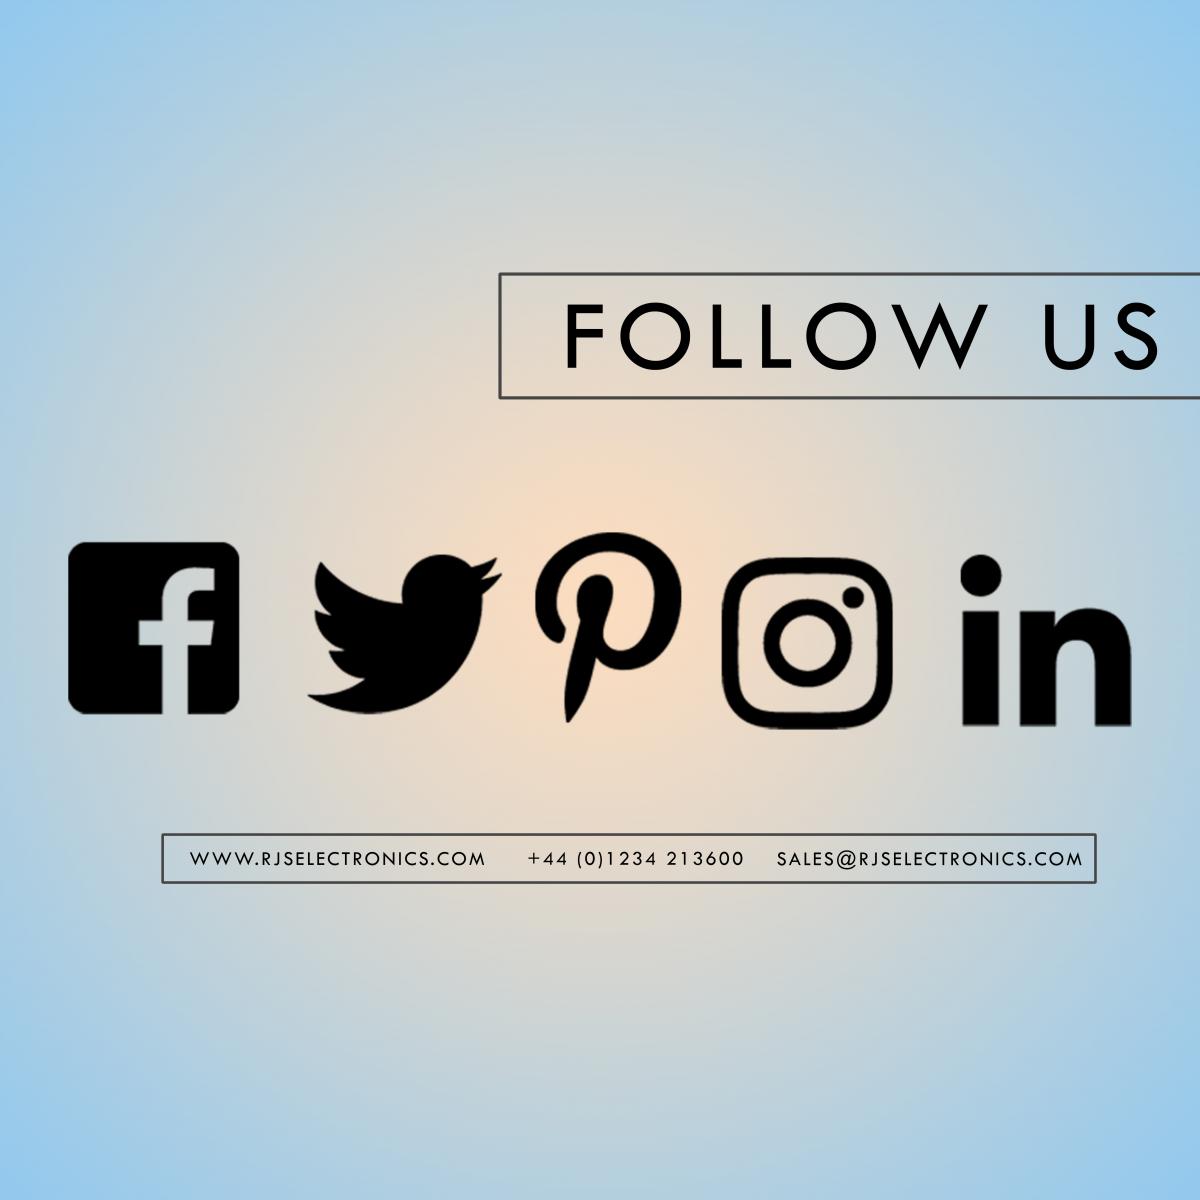 facebook, twitter, pinterest, instagram, linkedin, RJS Electronics Ltd